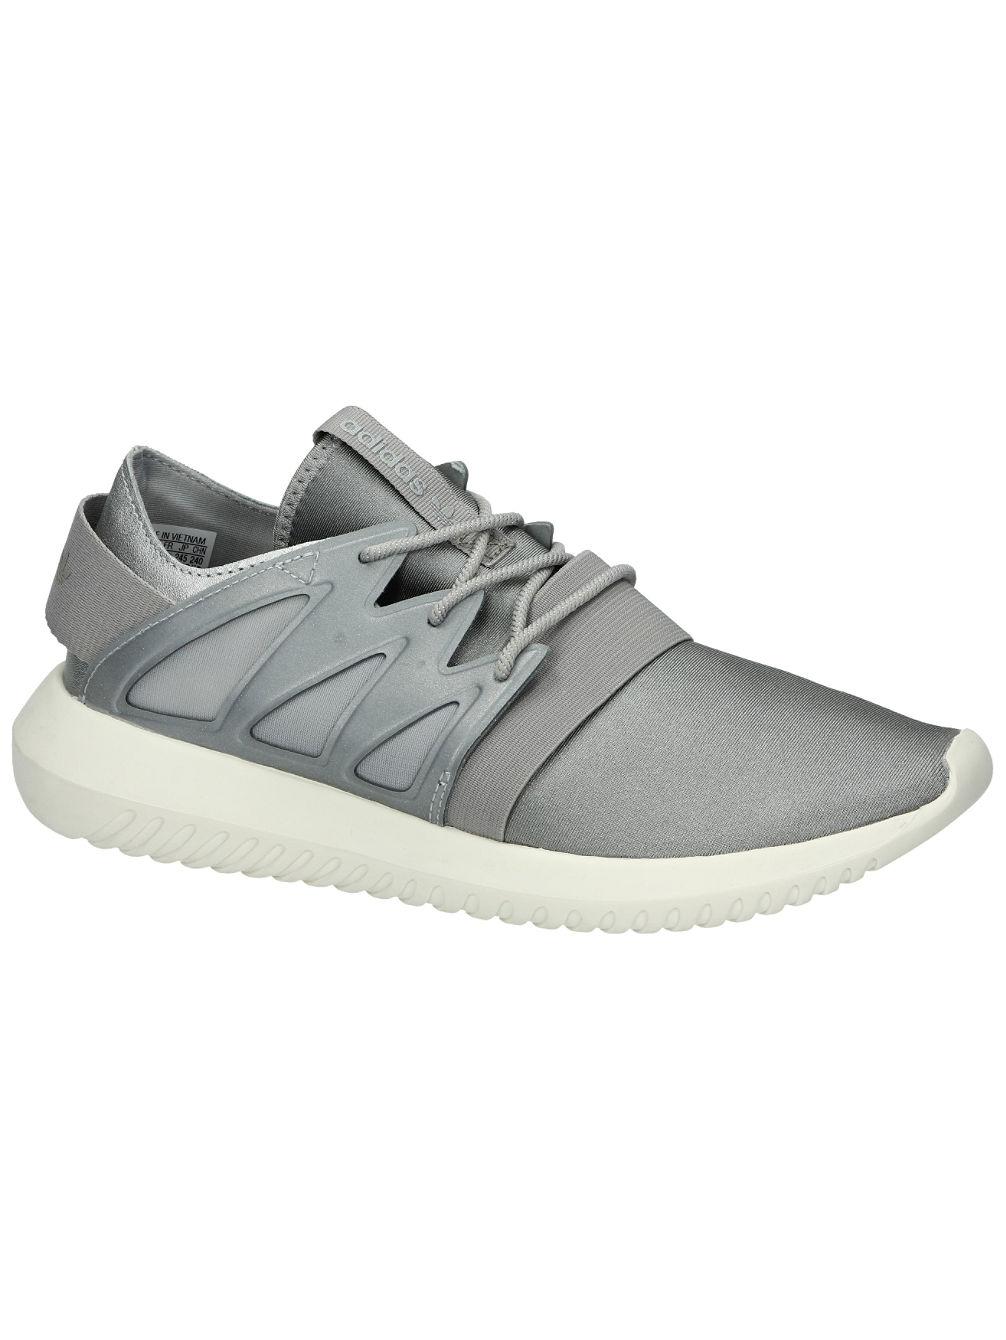 adidas-originals-tubular-viral-sneakers